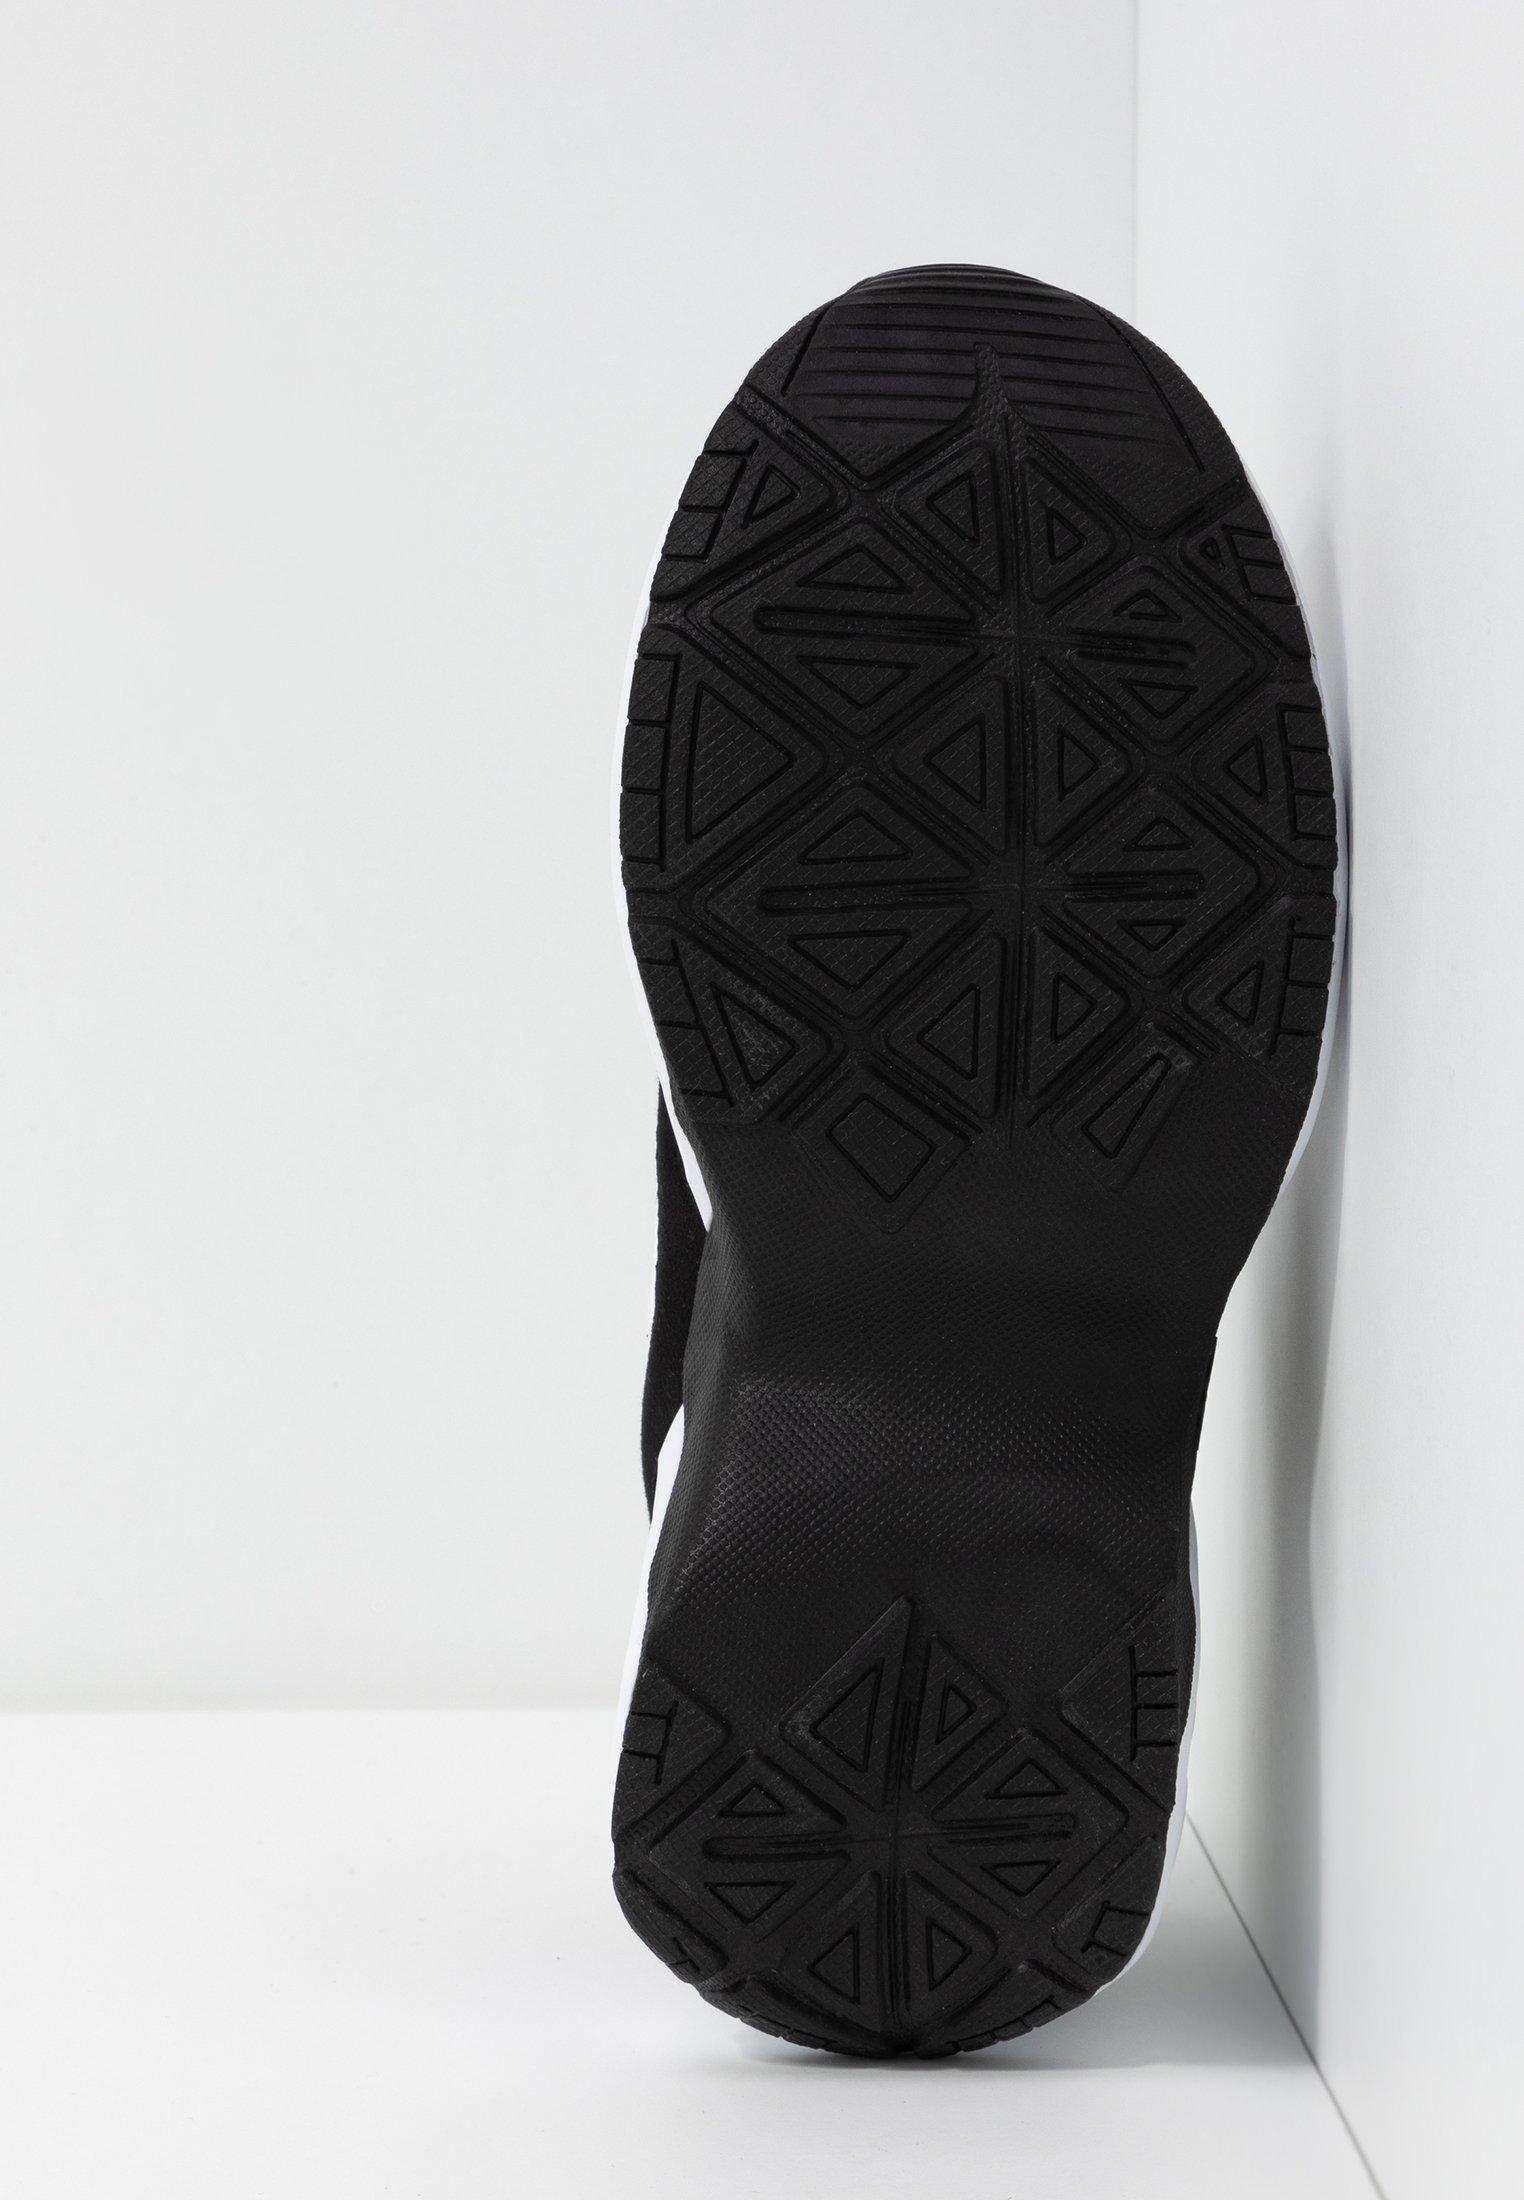 New Cheapest Kappa OVERTON - Sports shoes - white/black | men's shoes 2020 qYRwy